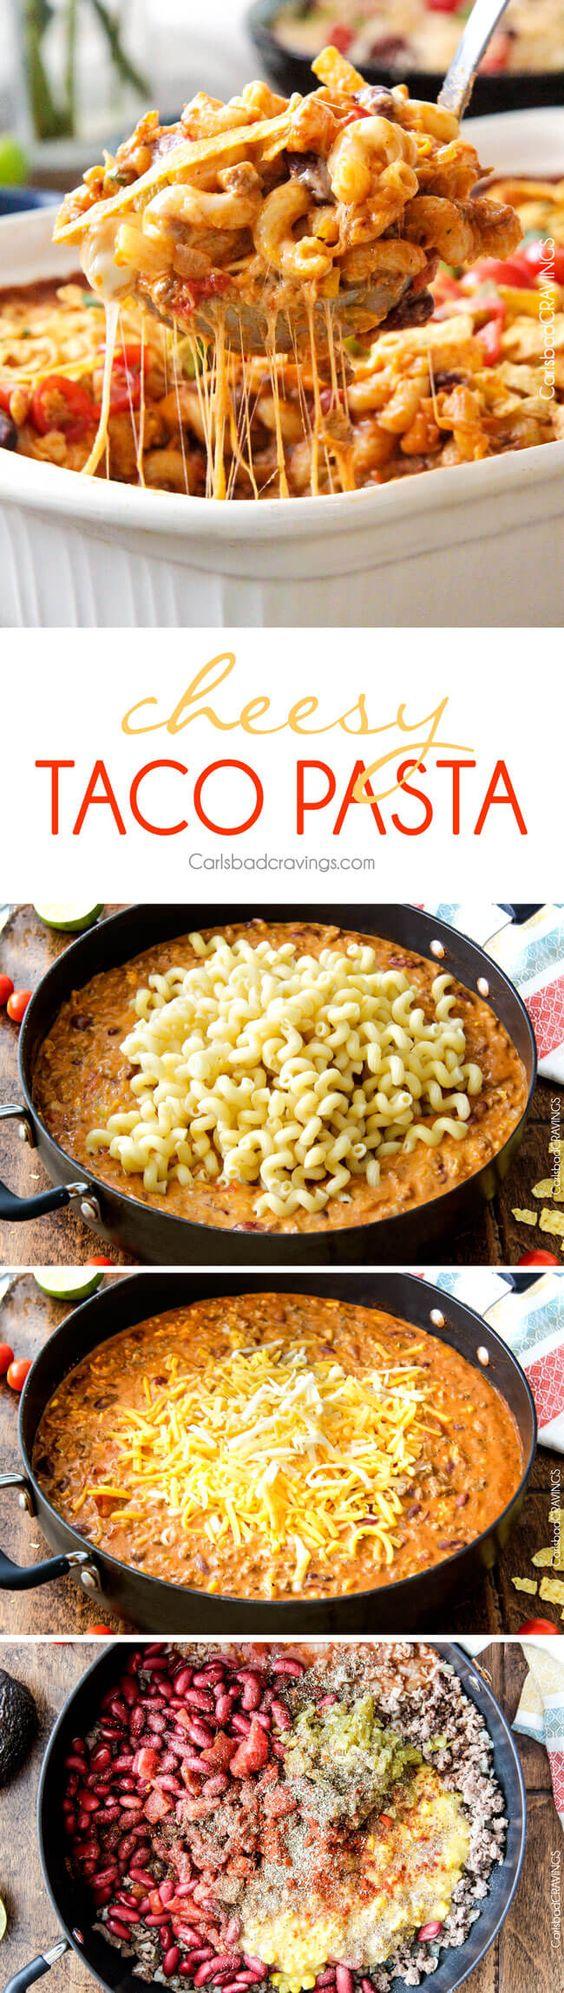 Taco Pasta Bake | Recipe | Tacos, Creamy Sauce and Lighter